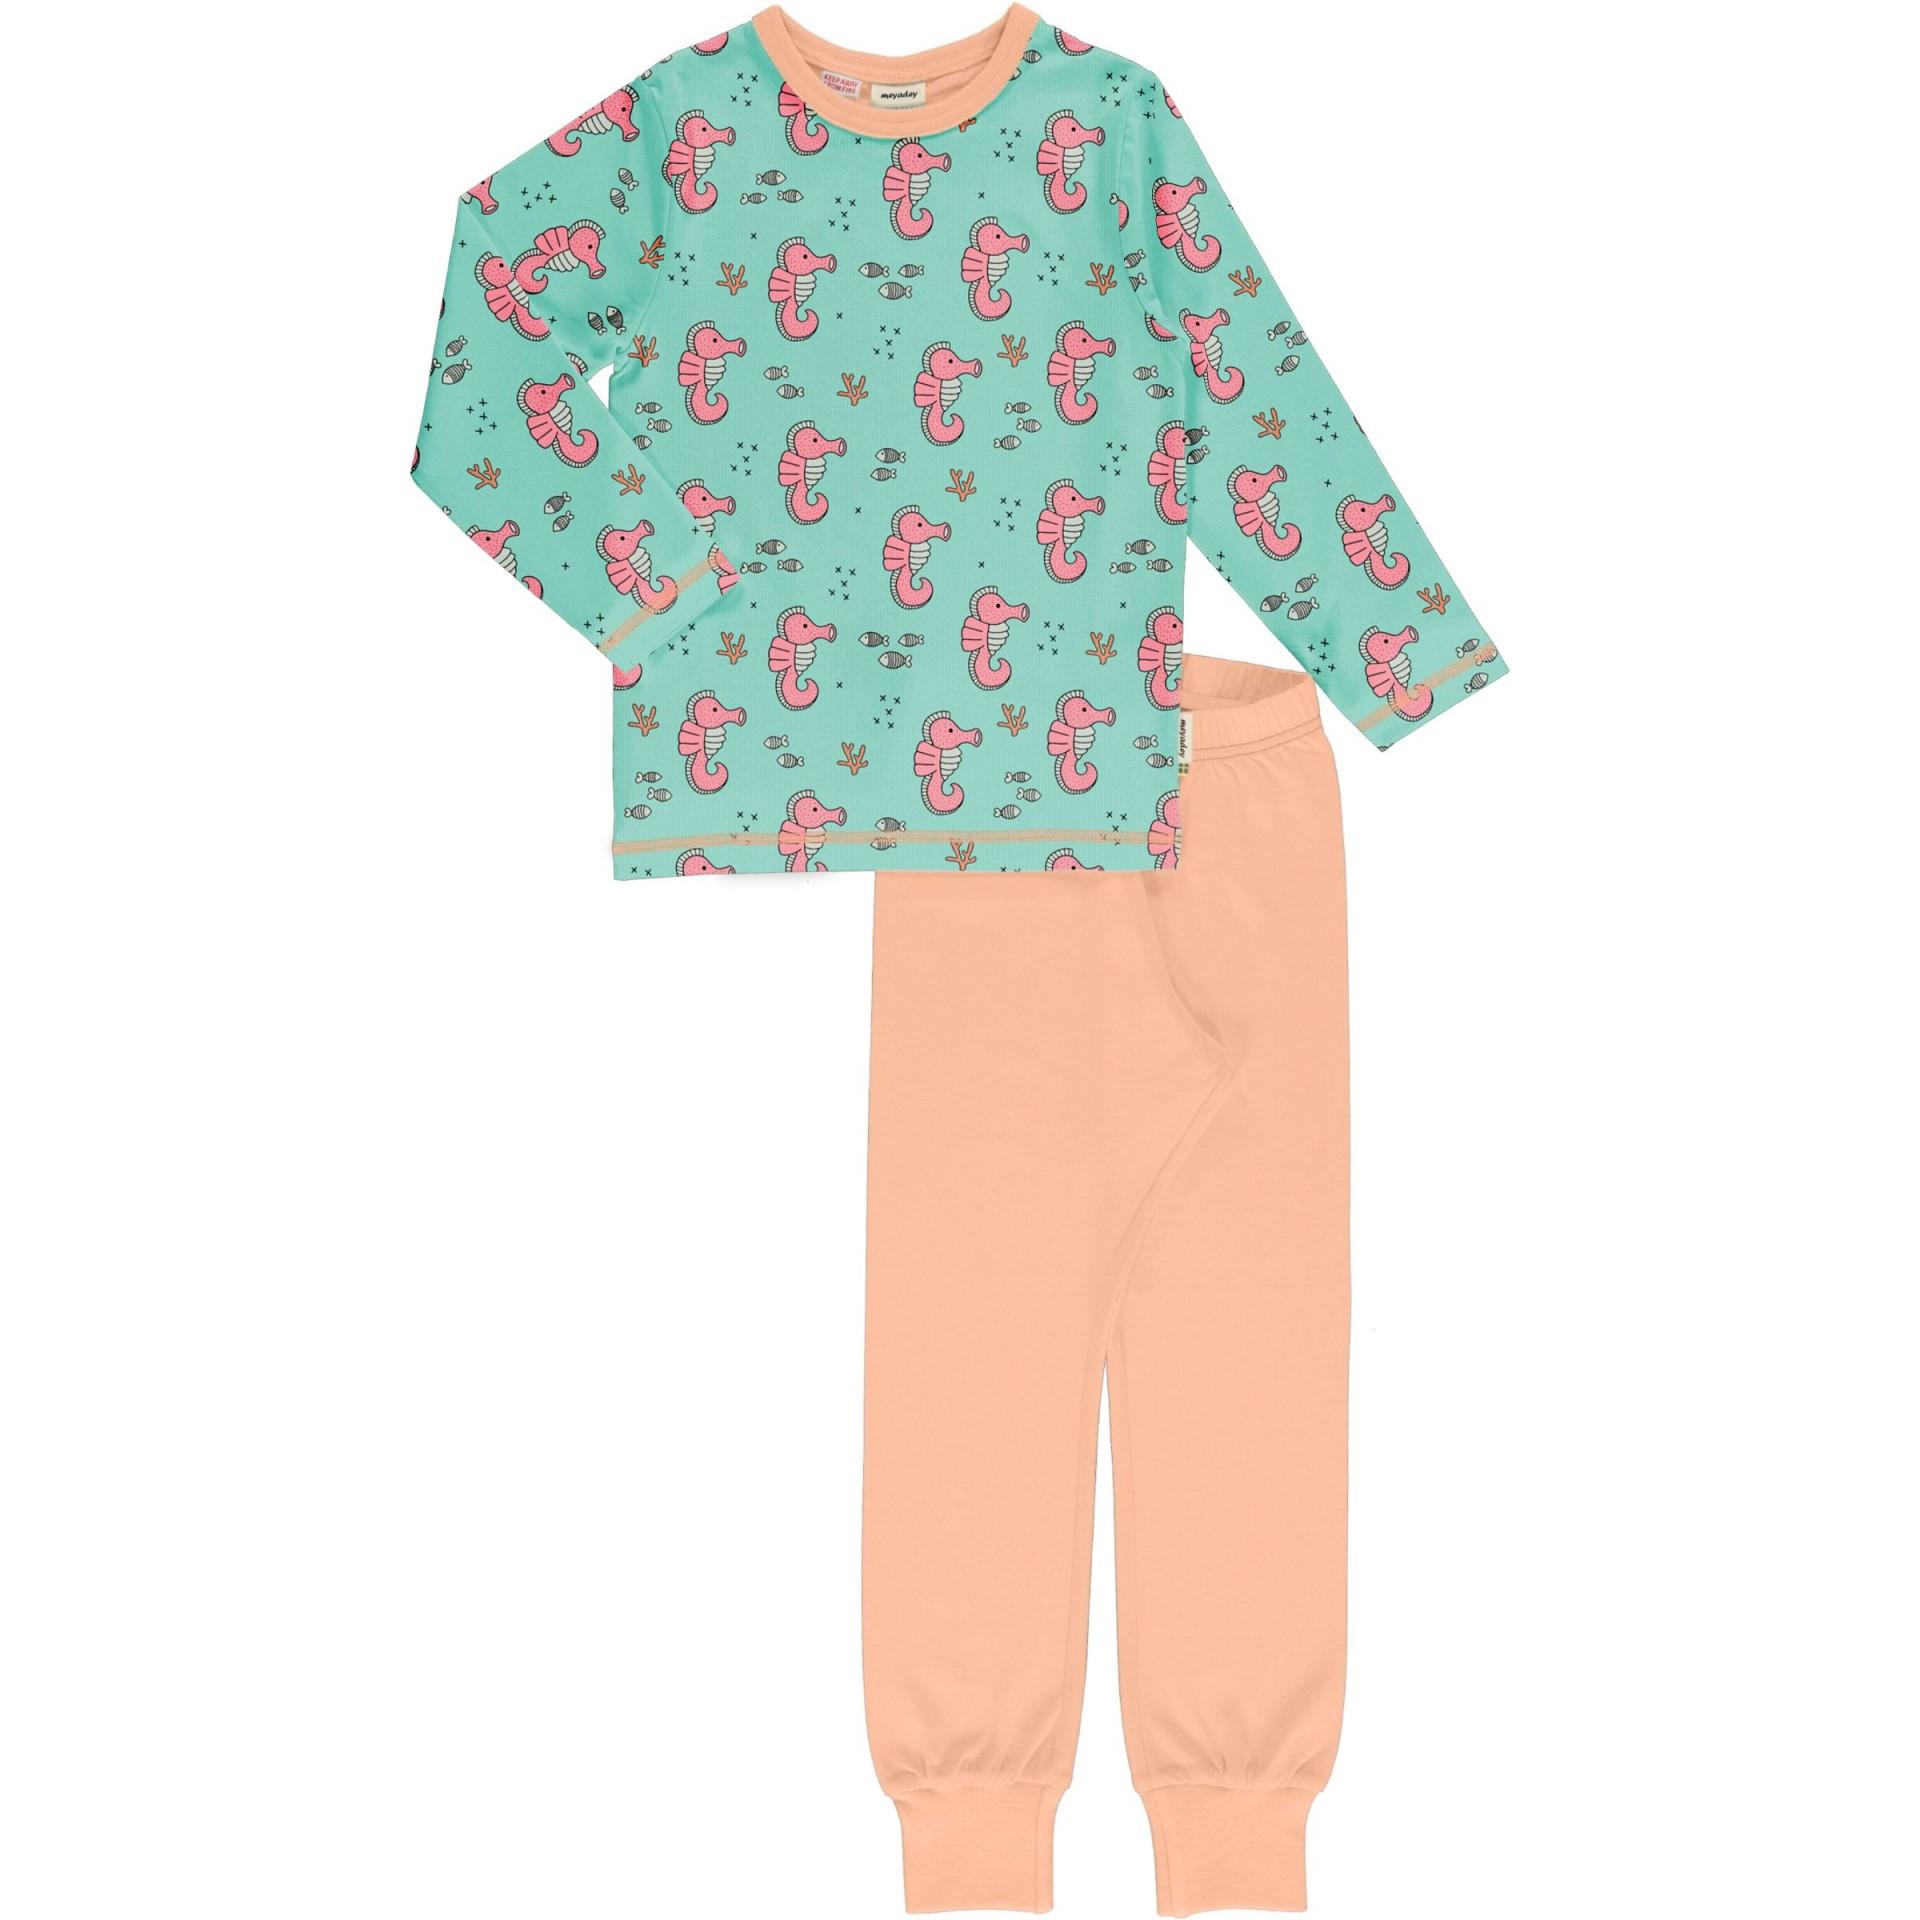 Pijama SEA HORSES Meyaday (Tamanhos disponíveis 3-4a, 5-6a)